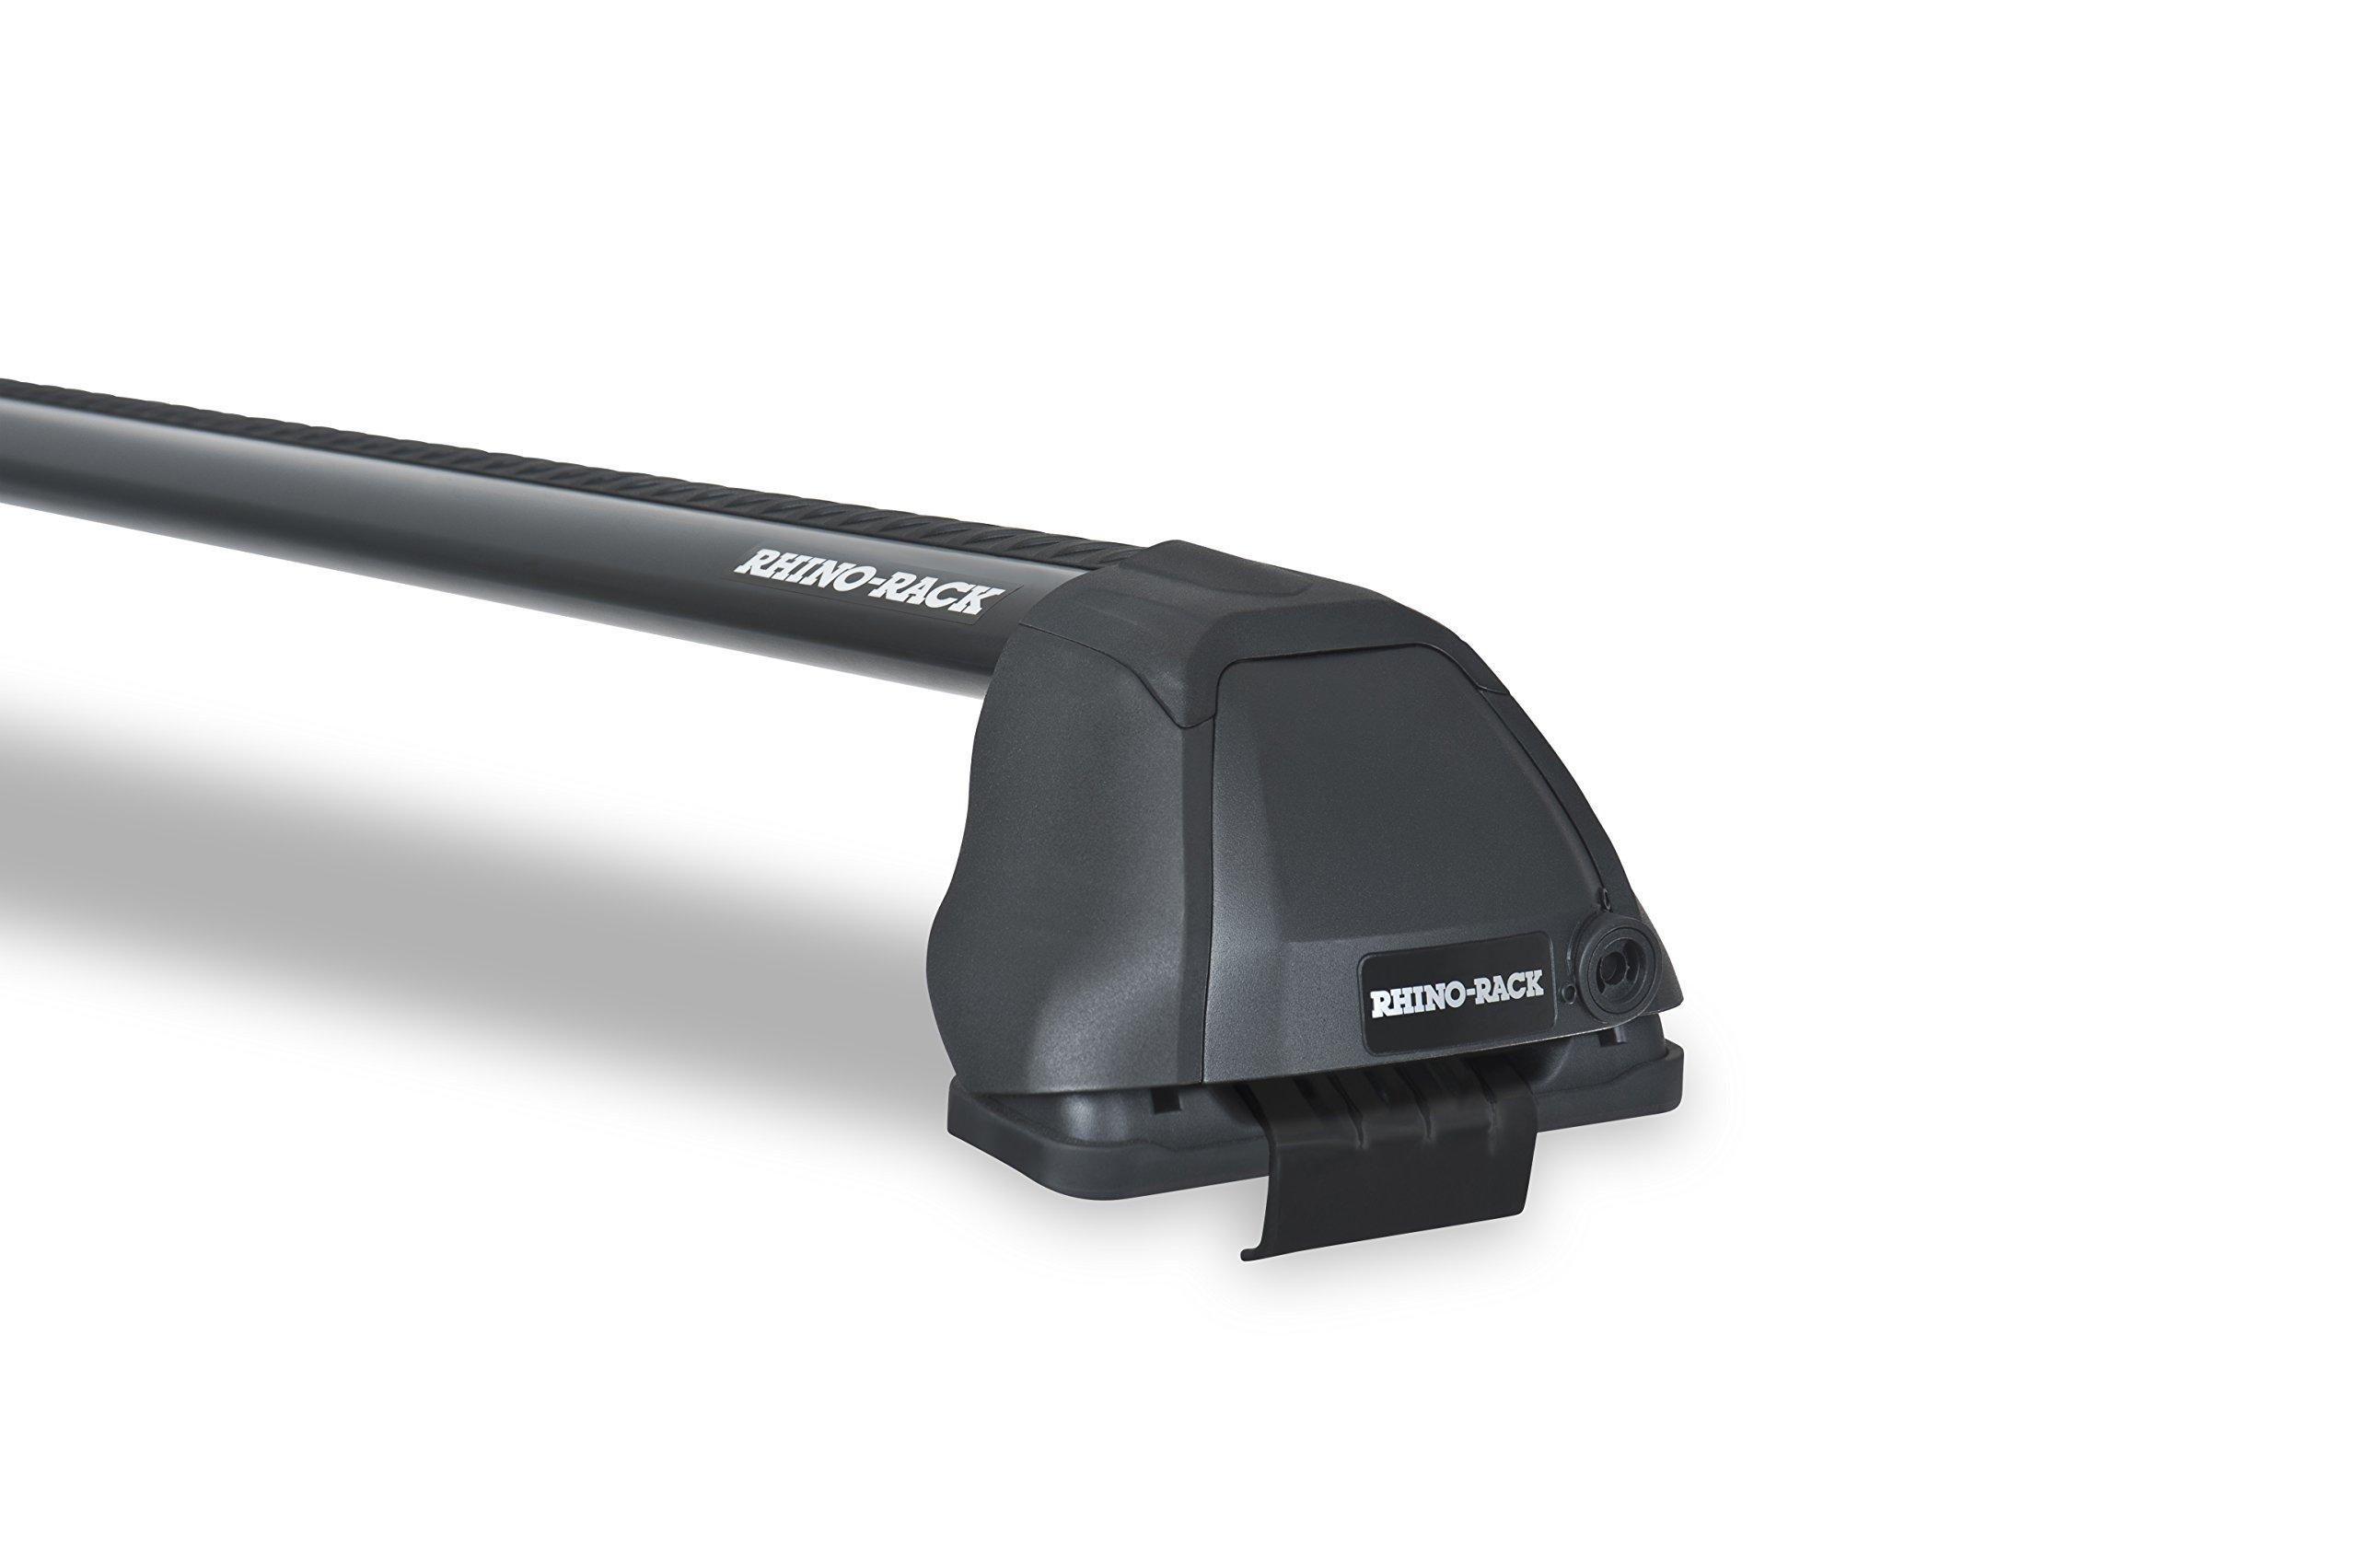 Rhino Rack Vortex 2500 RS Black 2 Bar Roof Rack